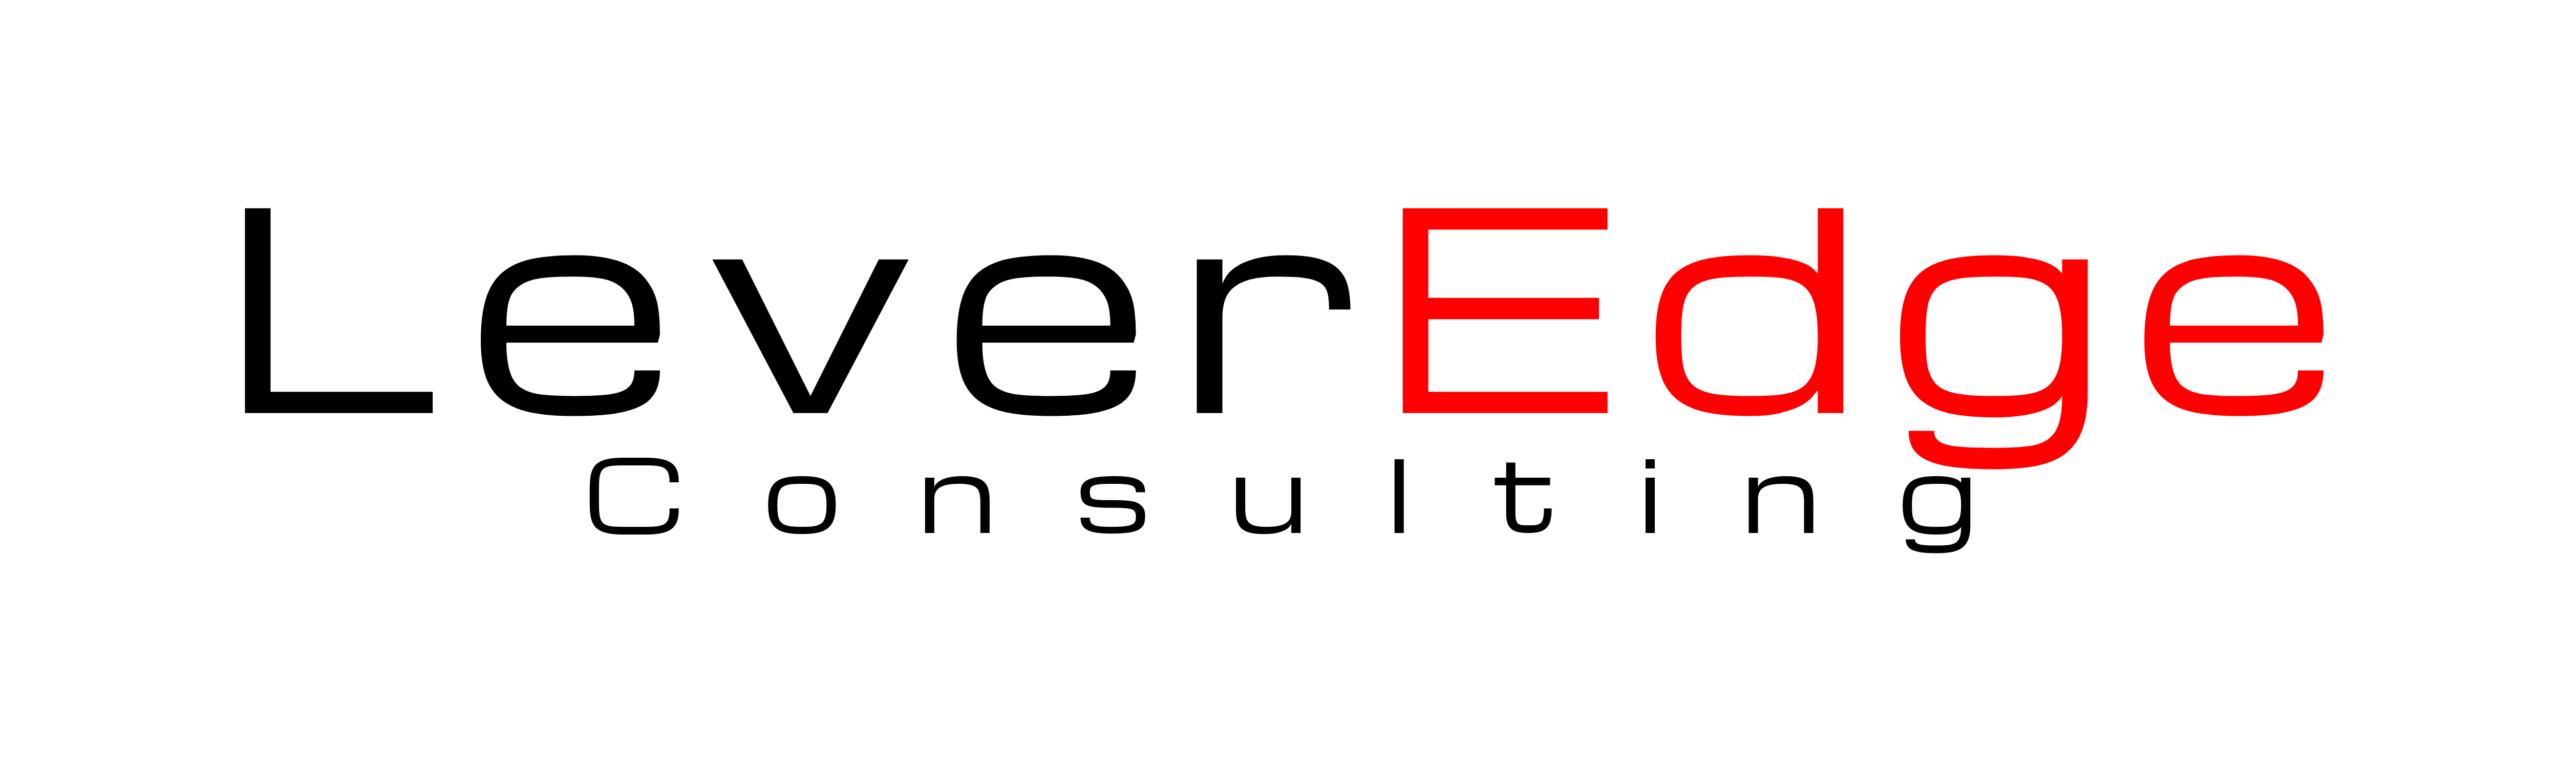 LeverEdge Consulting